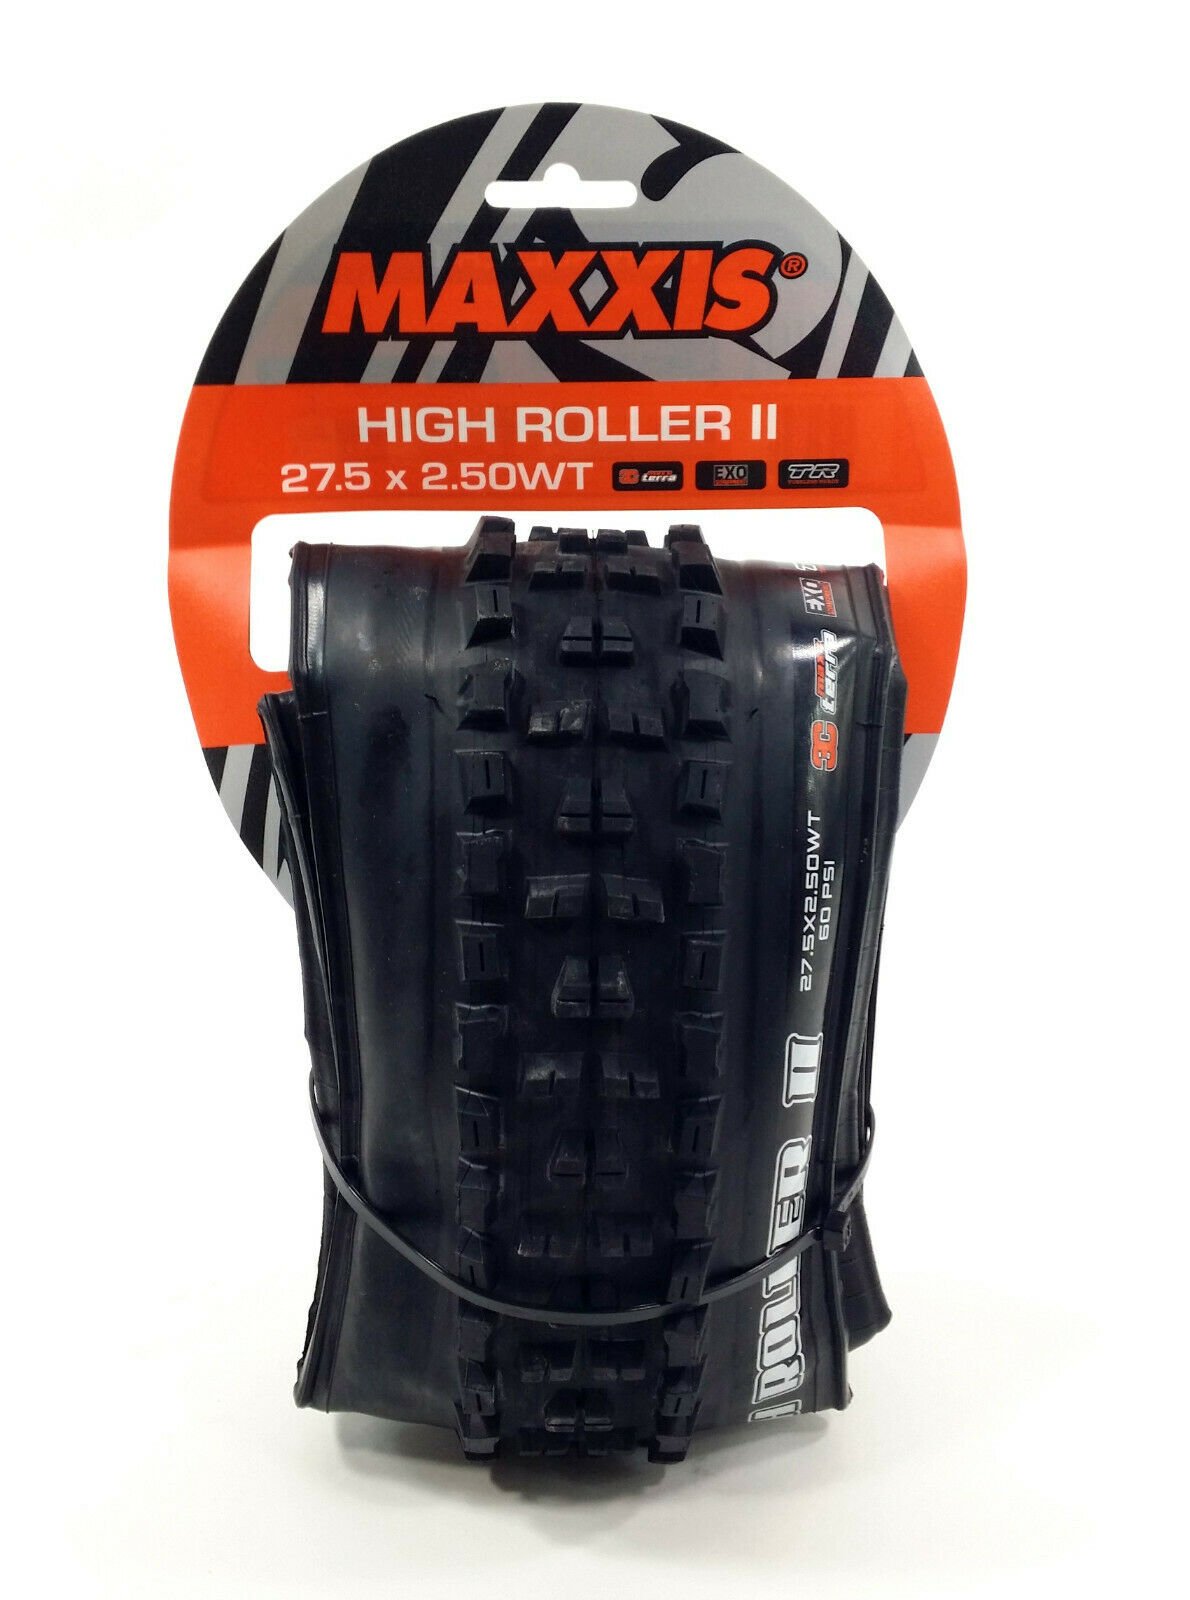 Maxxis High Roller II  WT Tire 27.5 x 2.5  60tpi 3C MaxxTerra EXO Tubeless  amazing colorways